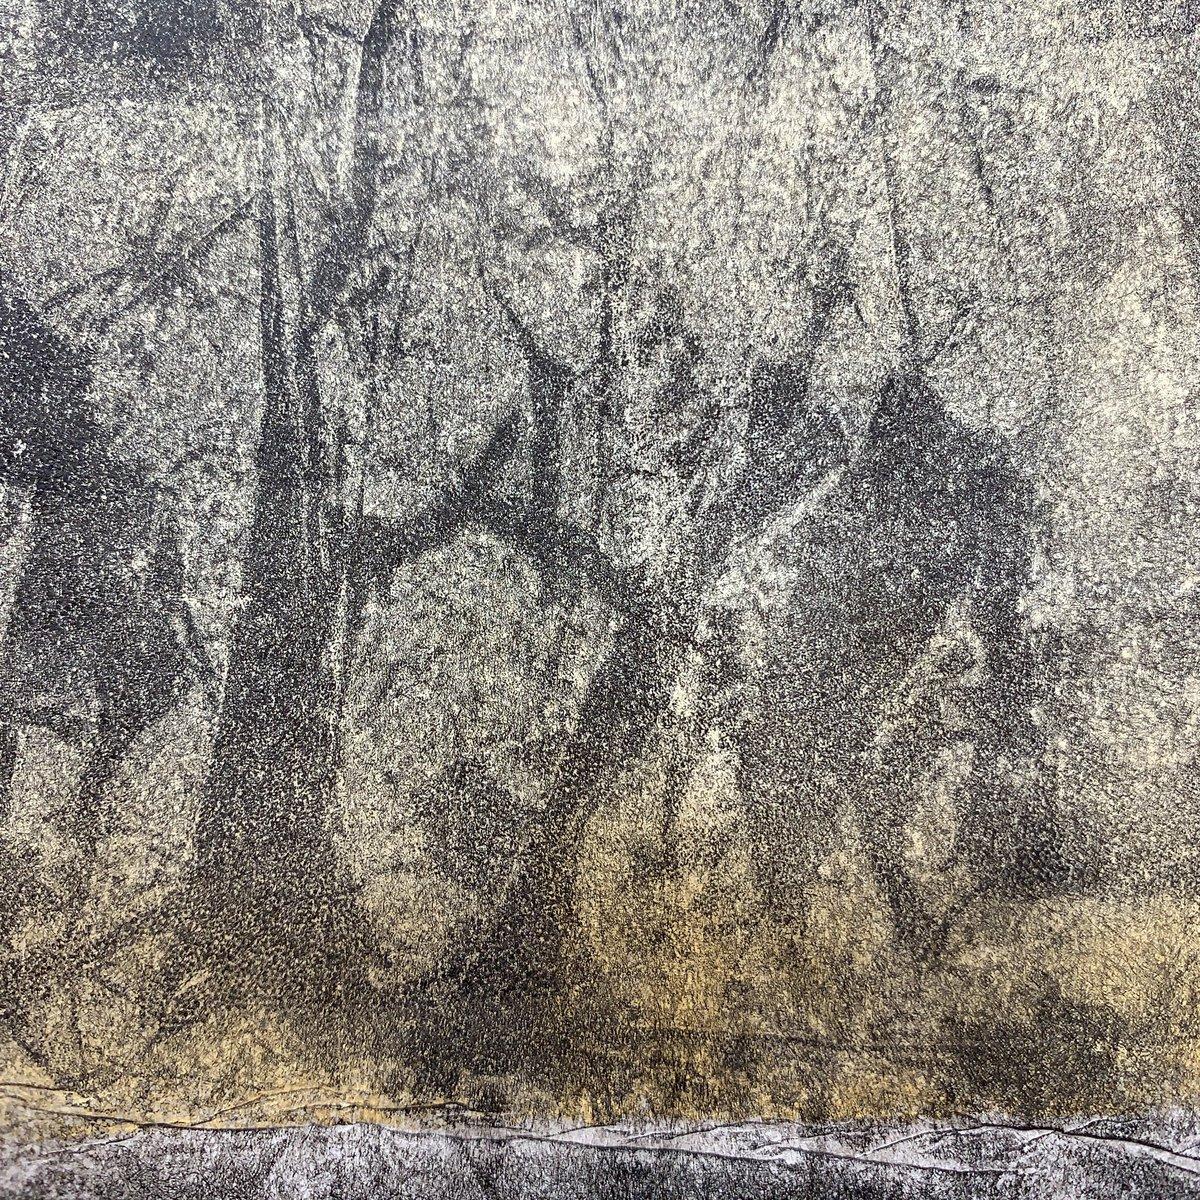 A small inky bit from a test Monoprint from last week's work.  Ideas moving forward...😀 #MondayMotivation #ArtistOnTwitter #printmaking #inktober2020 #autumnvibes #October2020 #trees #QuietTime #art #ideas #Plymouth #Devon https://t.co/NojJAv2sRq